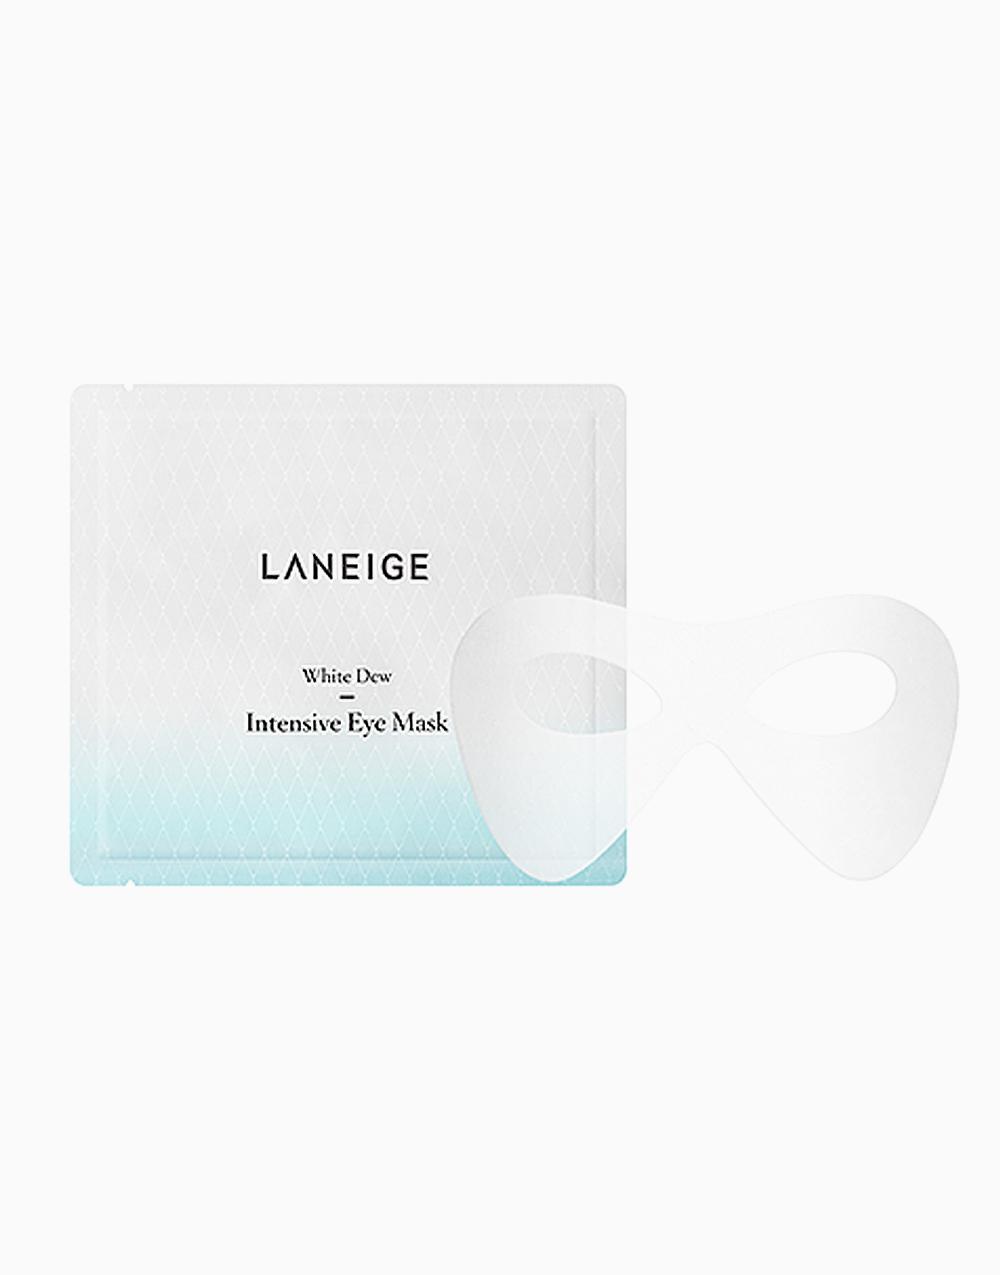 White Dew Intensive Eye Mask by Laneige